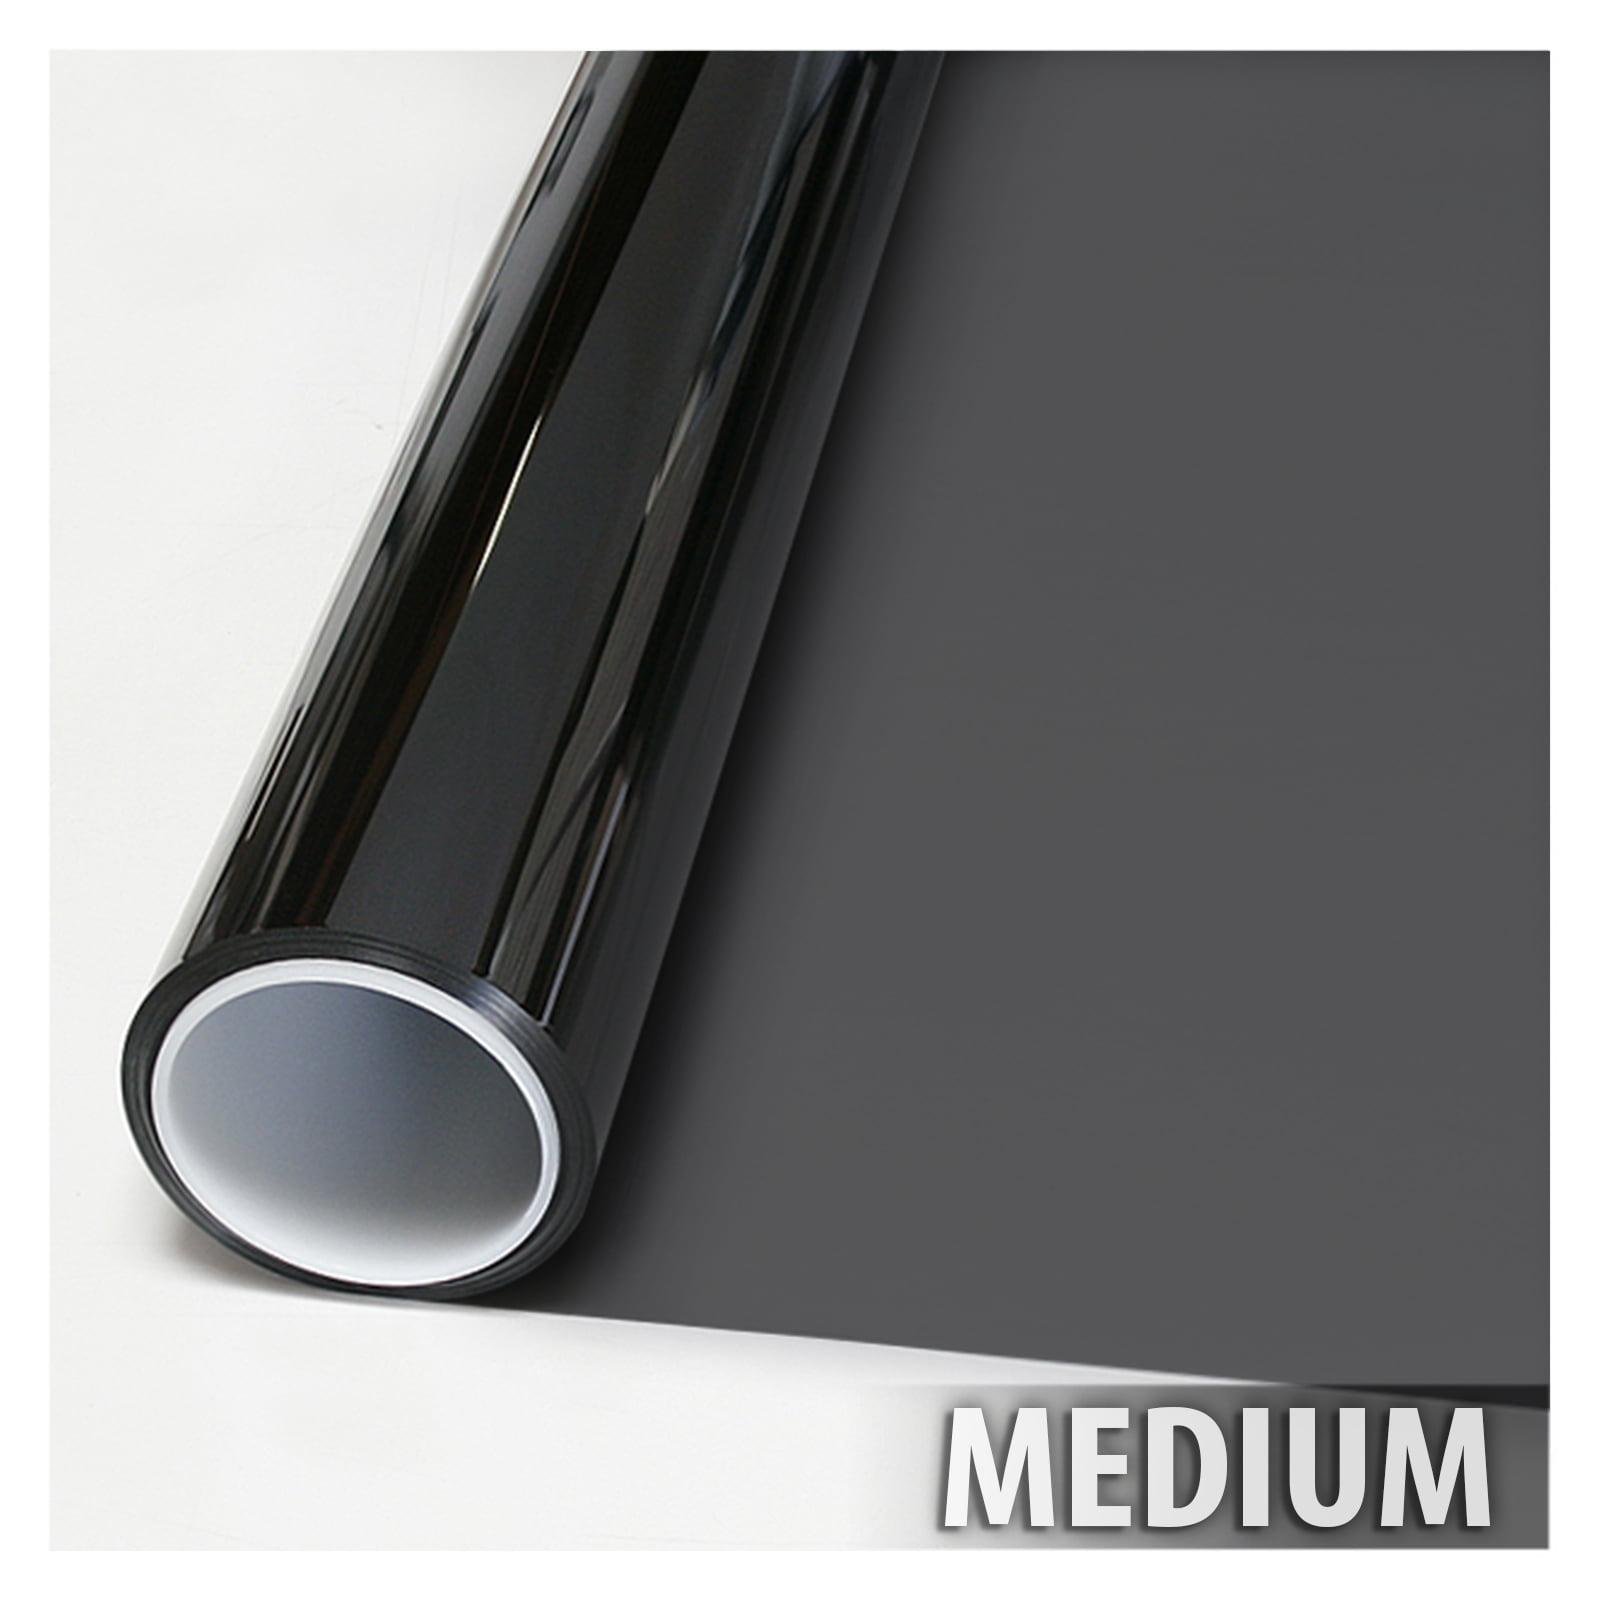 BDF NC35 Window Film Premium High Performance Heat Control Nichrome 35 Medium